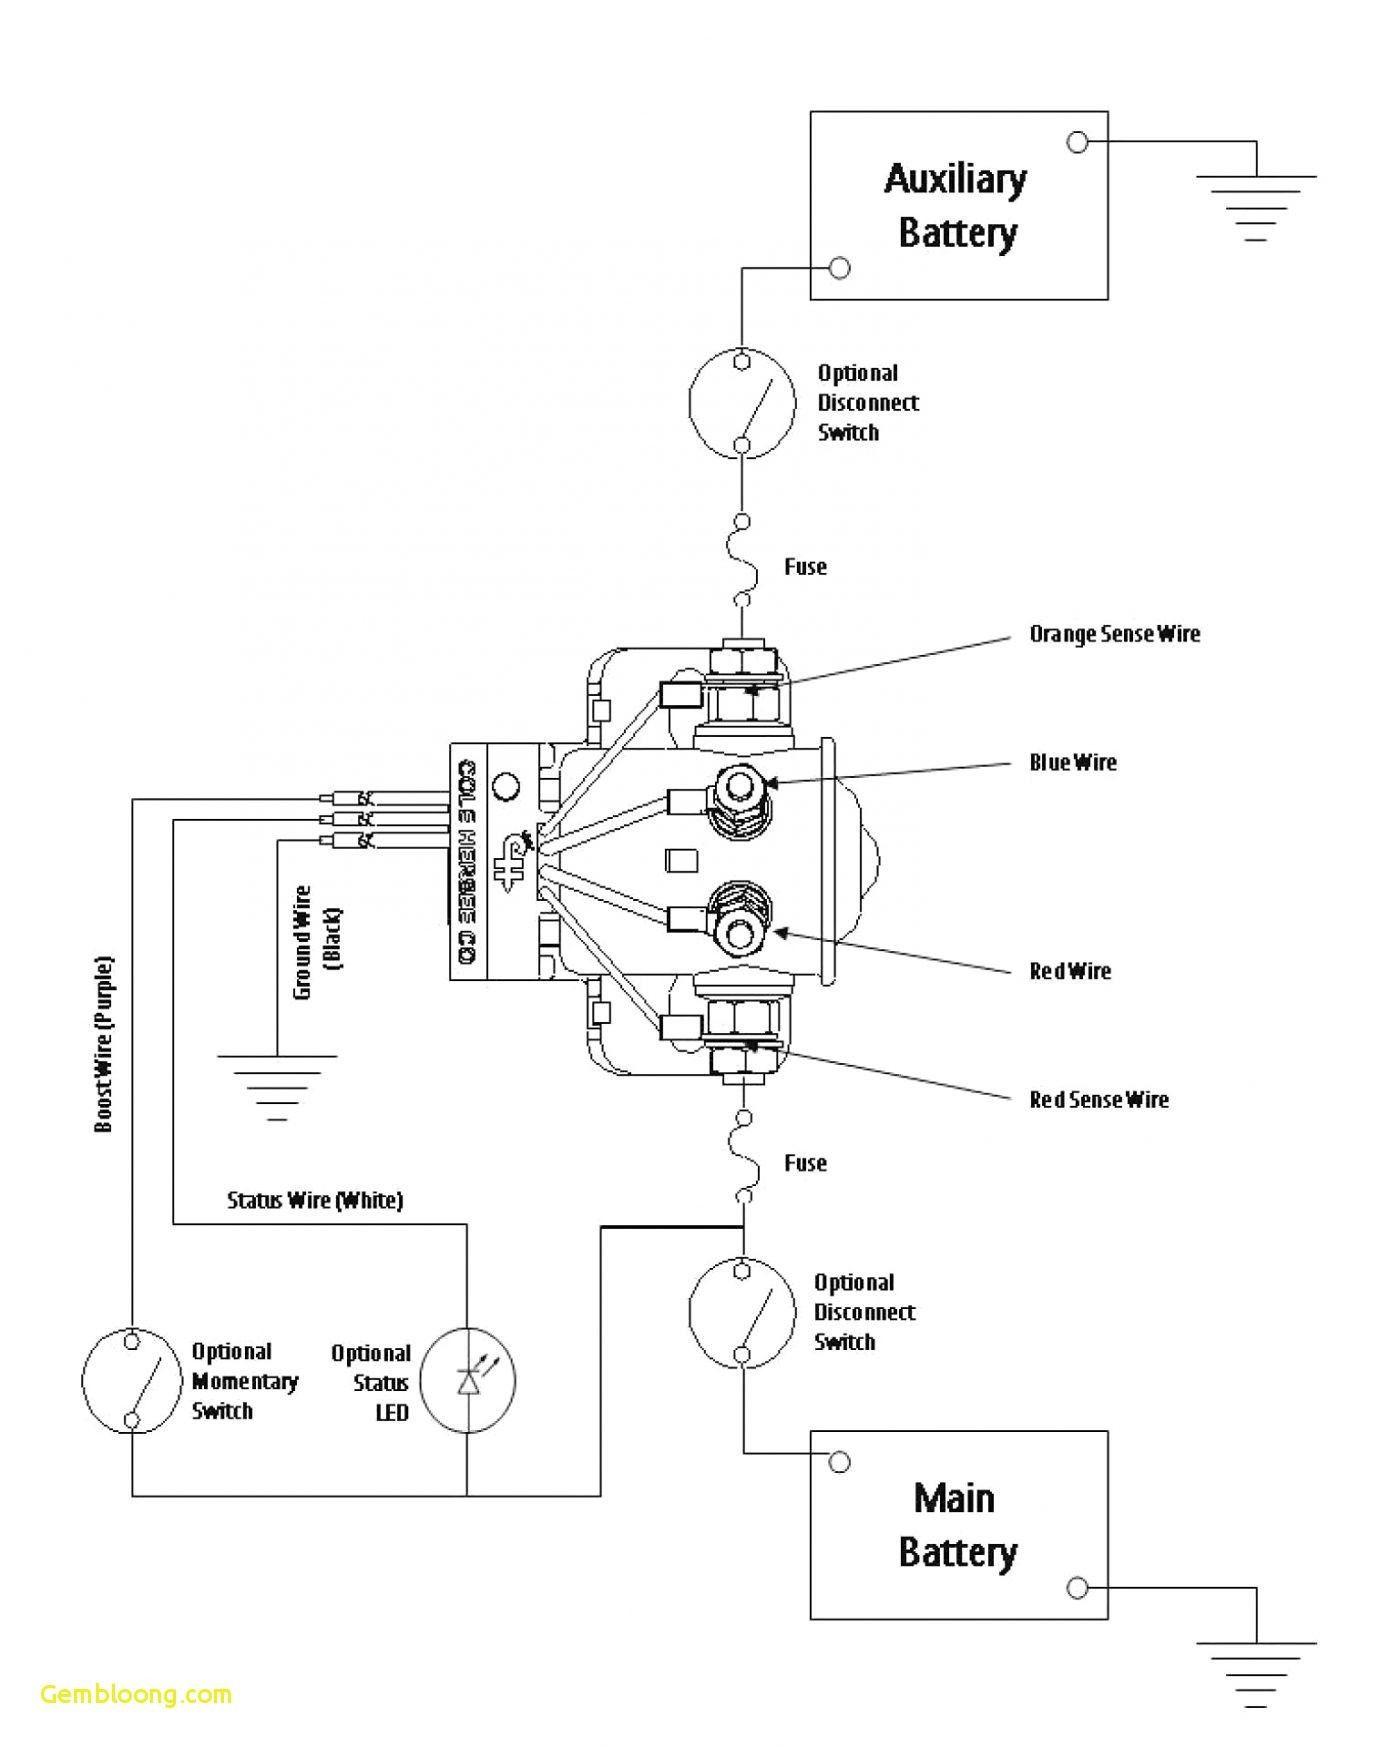 Lovely Wiring Diagram Alternator  Diagrams  Digramssample  Diagramimages  Wiringdiagramsample